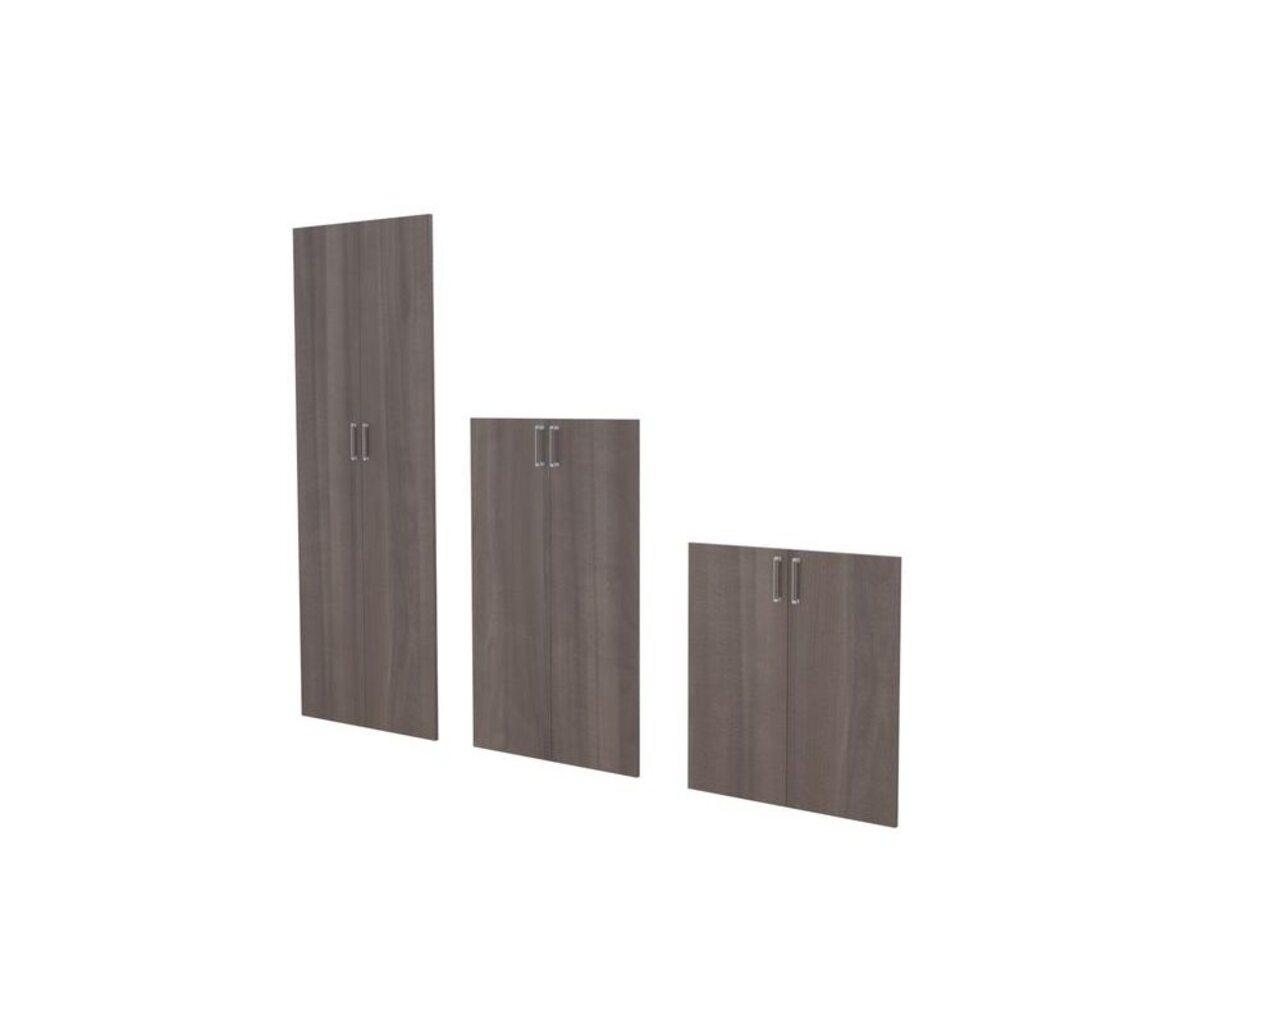 Двери из ЛДСП к широким стеллажам  Приоритет II 72x2x117 - фото 3